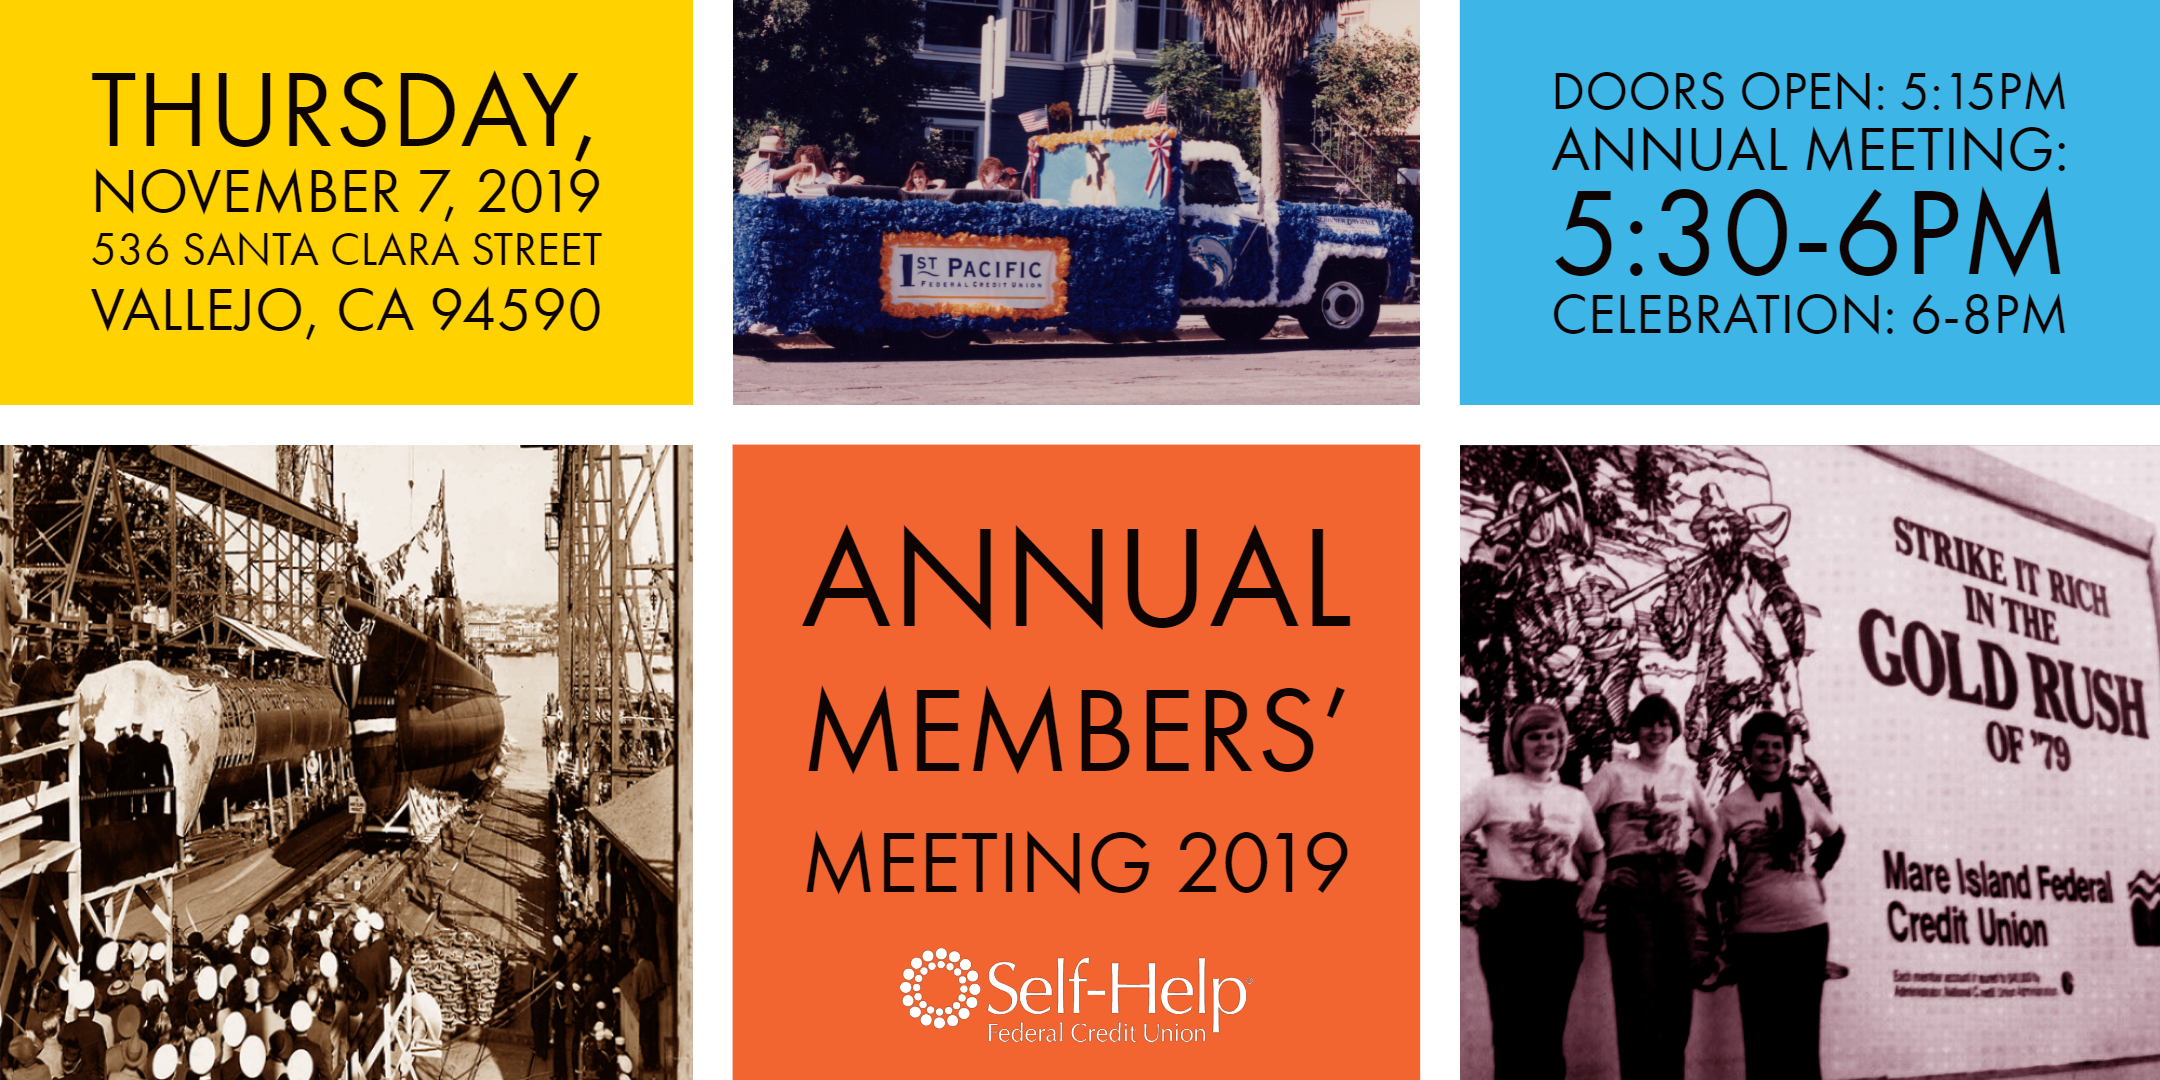 Annual Members' Meeting 2019